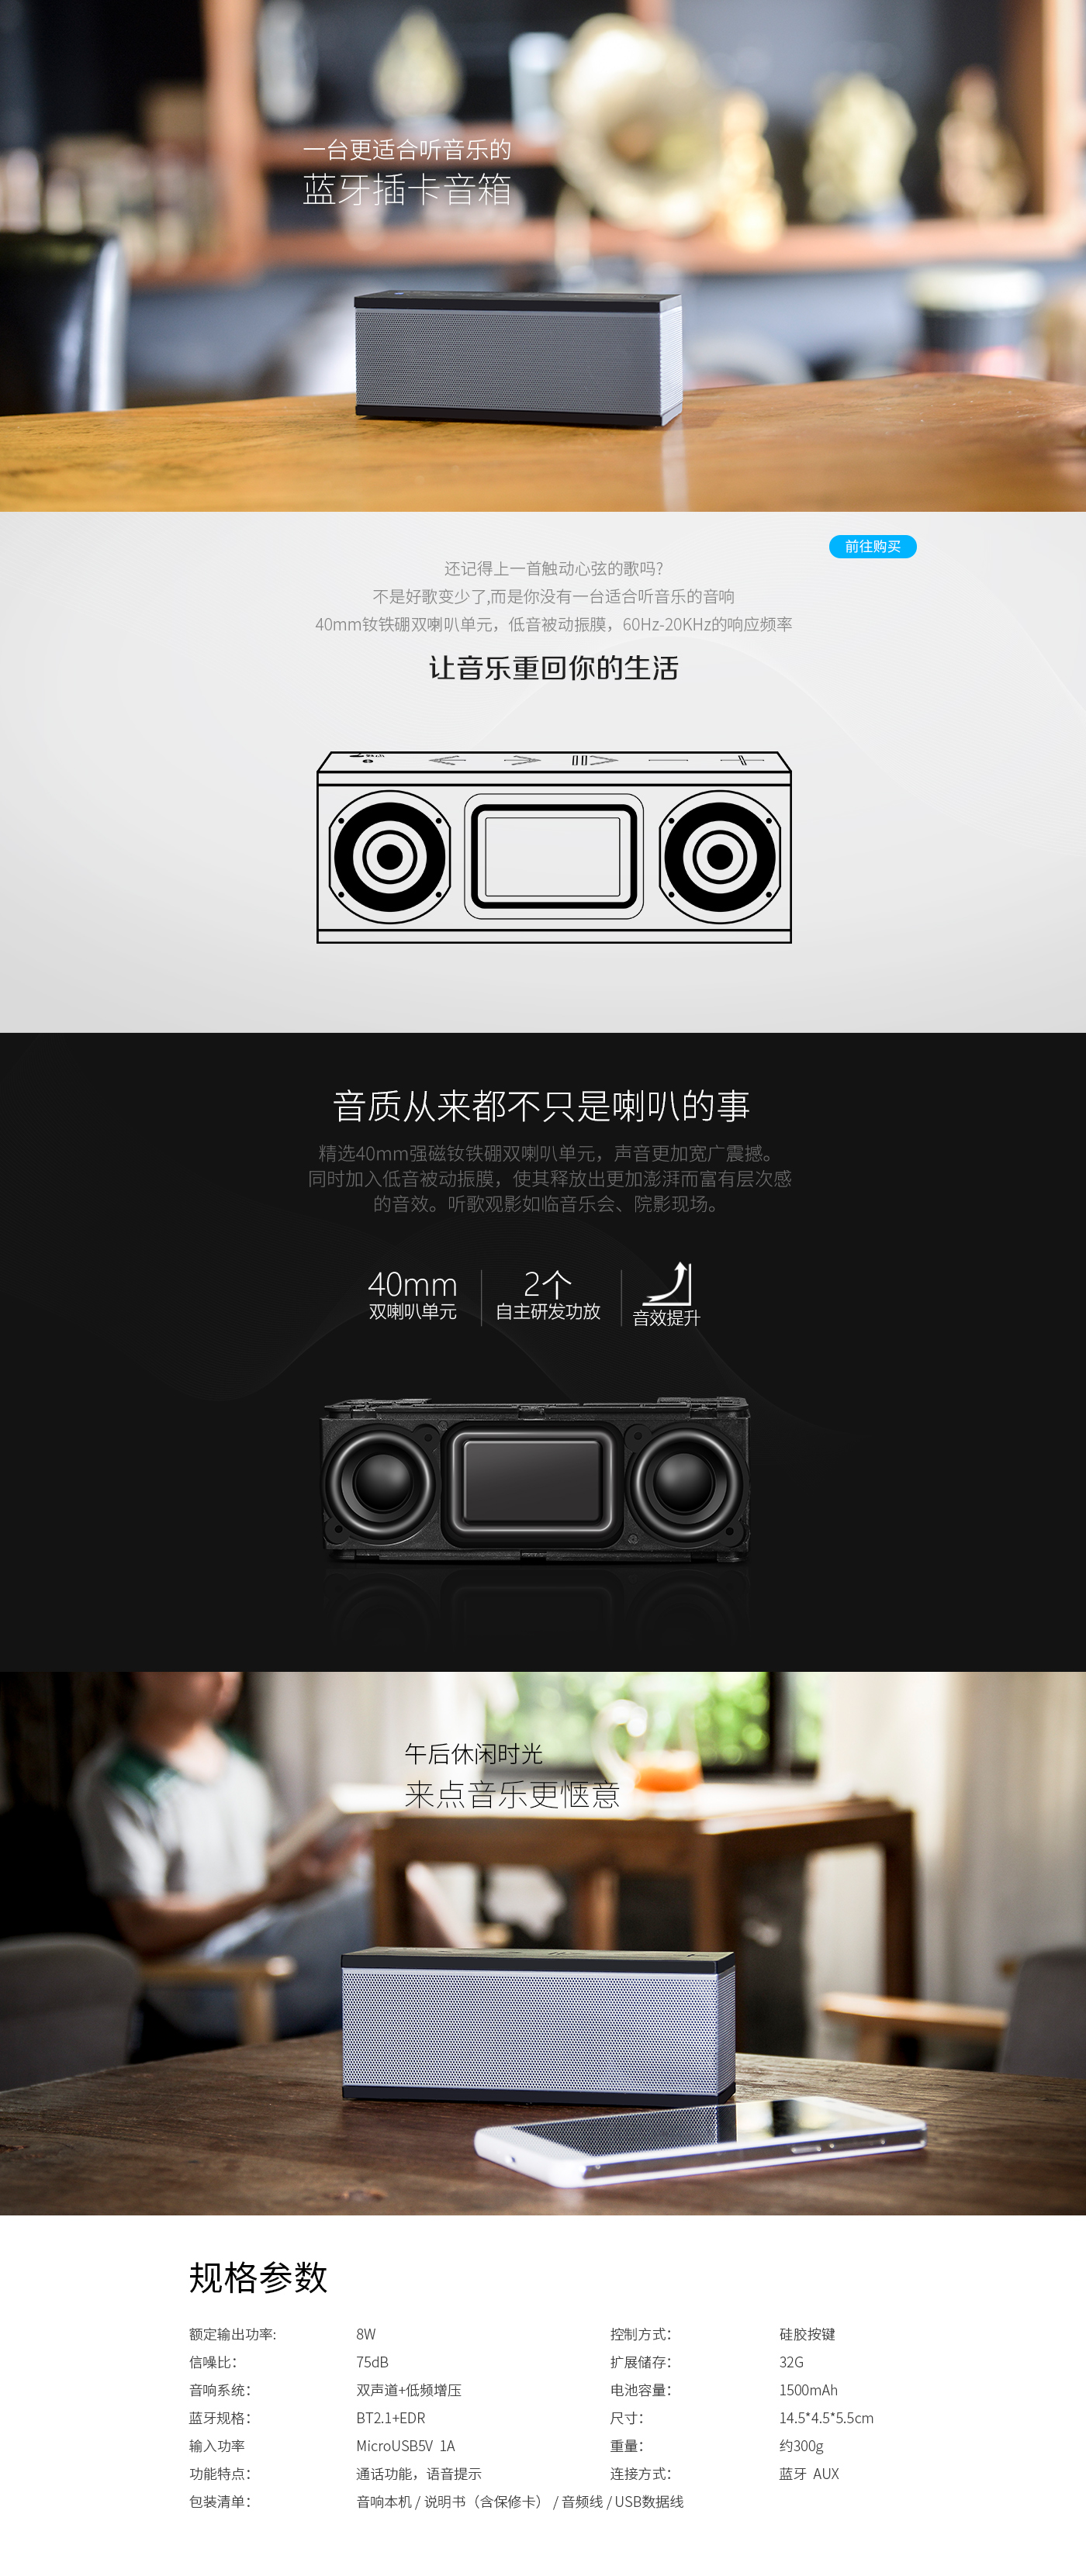 bmw55.com宝马娱乐城